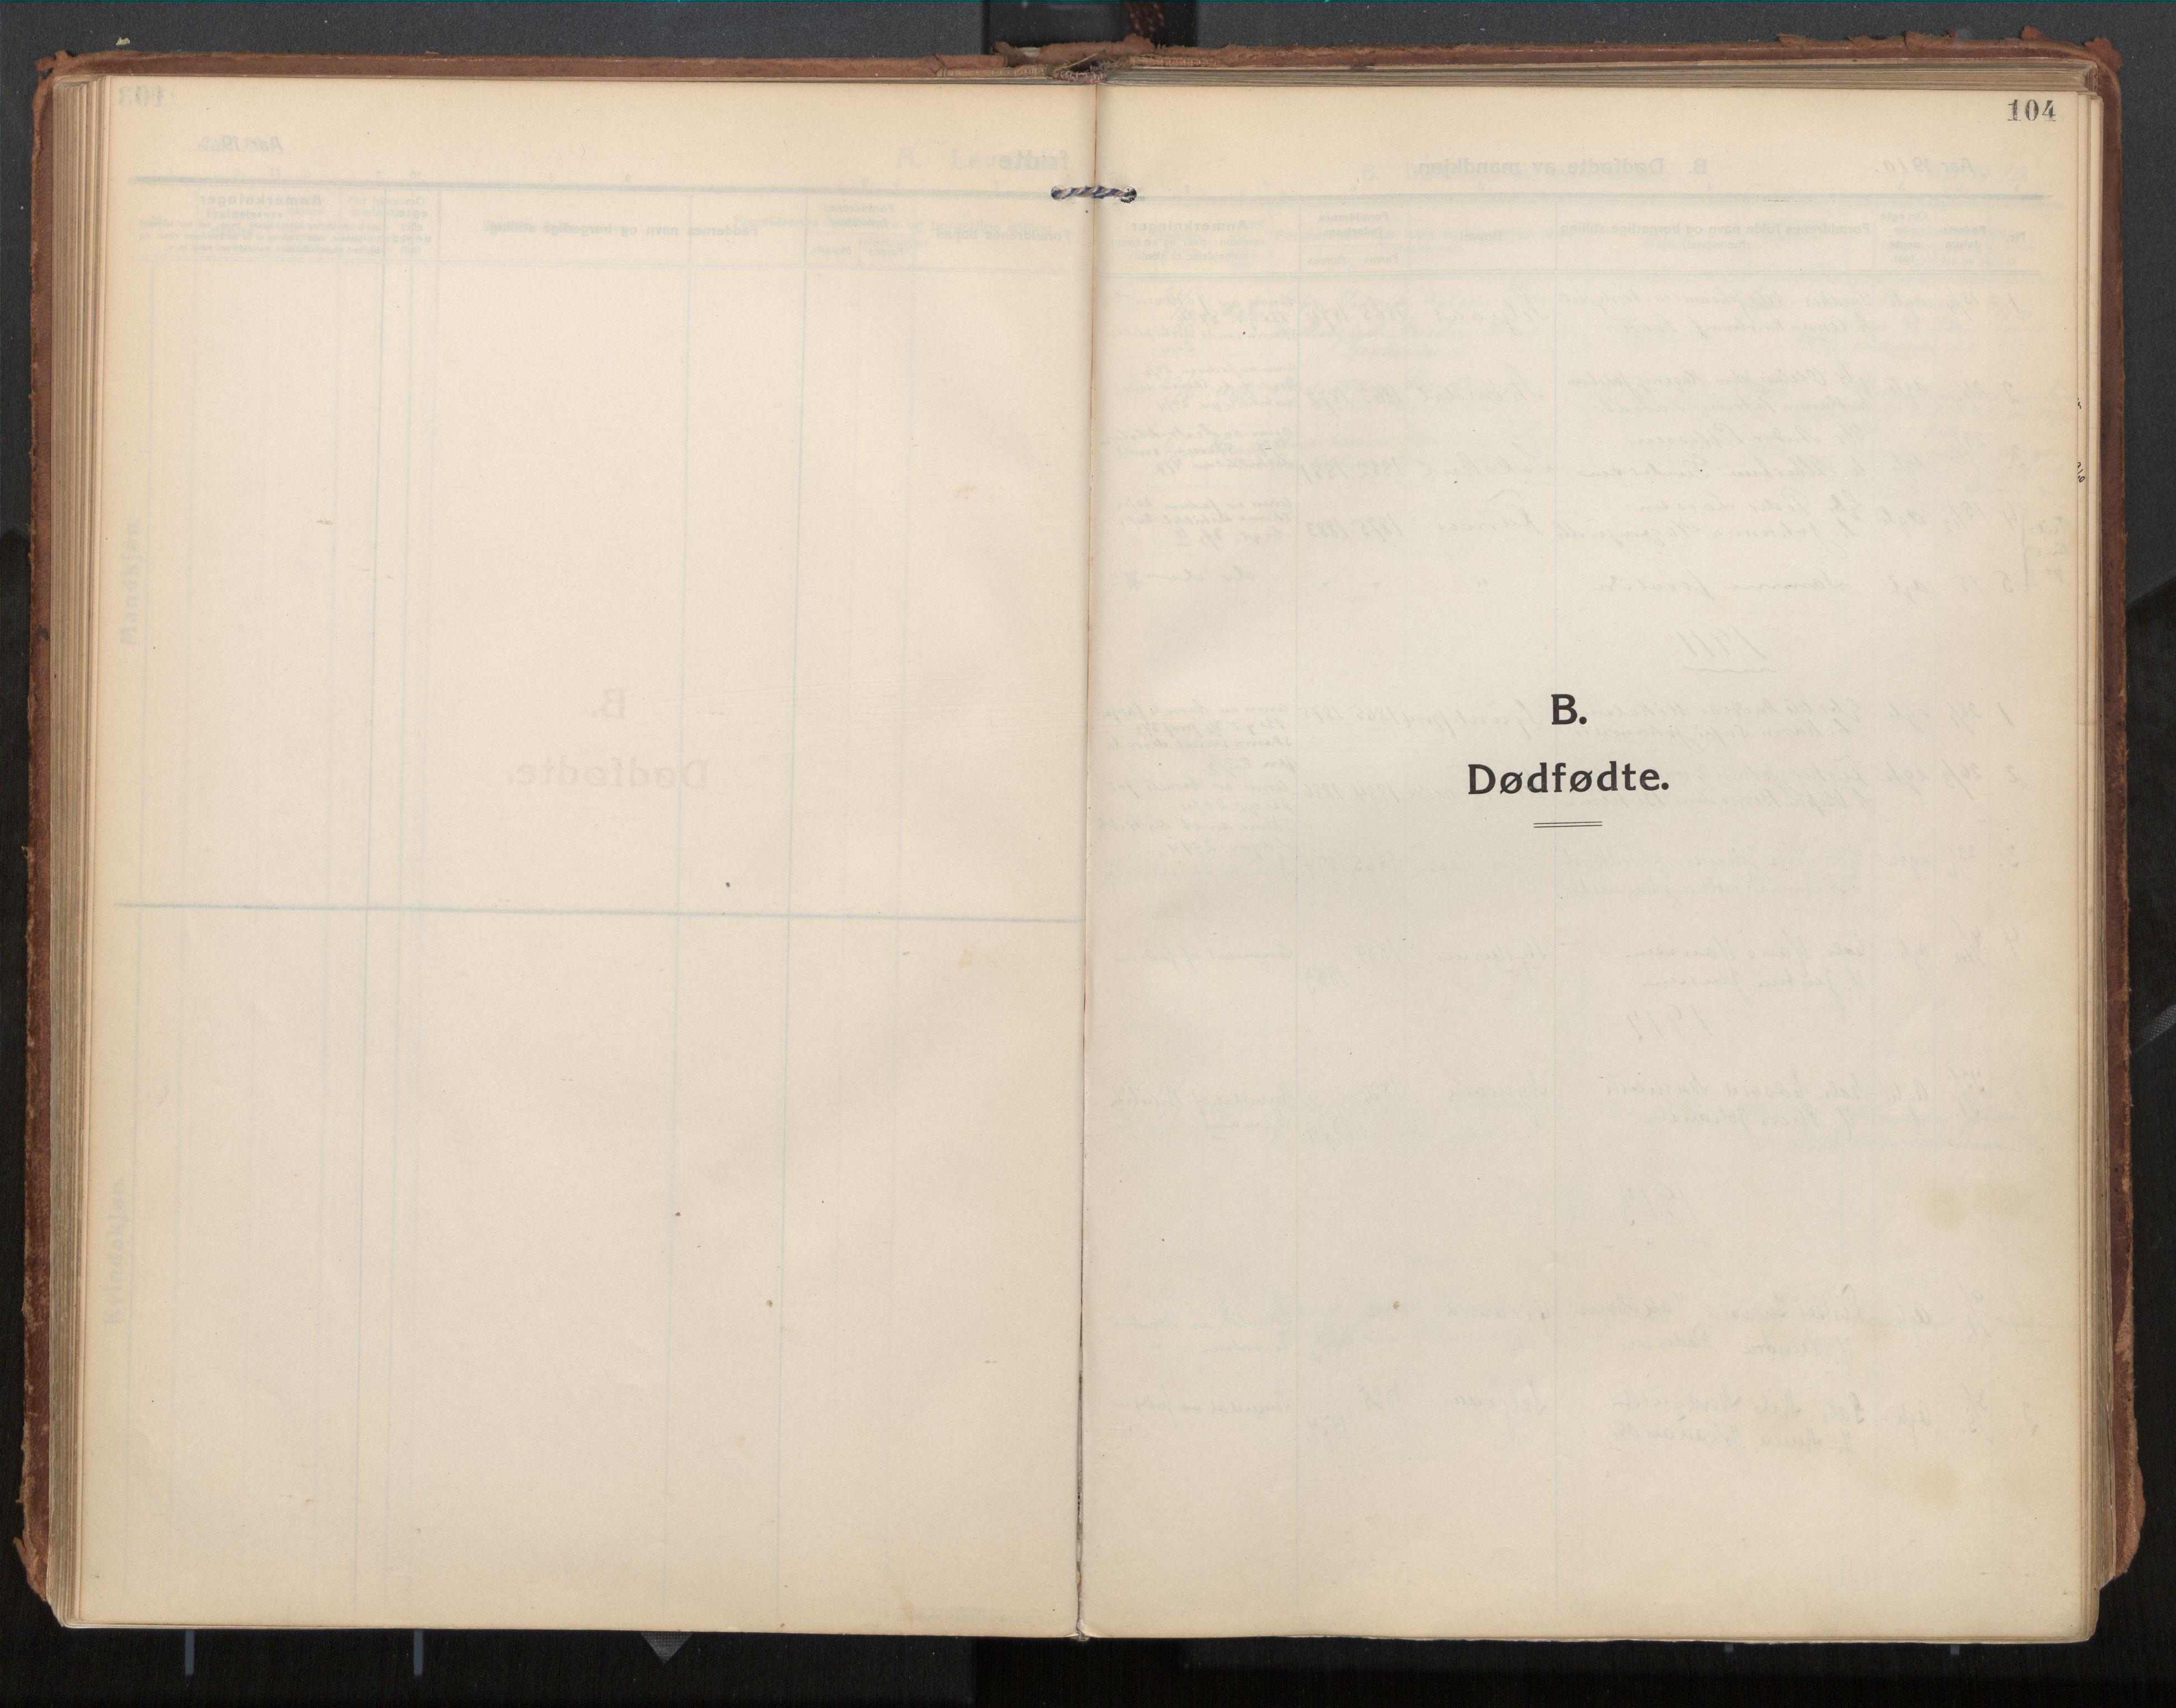 SAT, Ministerialprotokoller, klokkerbøker og fødselsregistre - Nordland, 854/L0784: Ministerialbok nr. 854A07, 1910-1922, s. 104